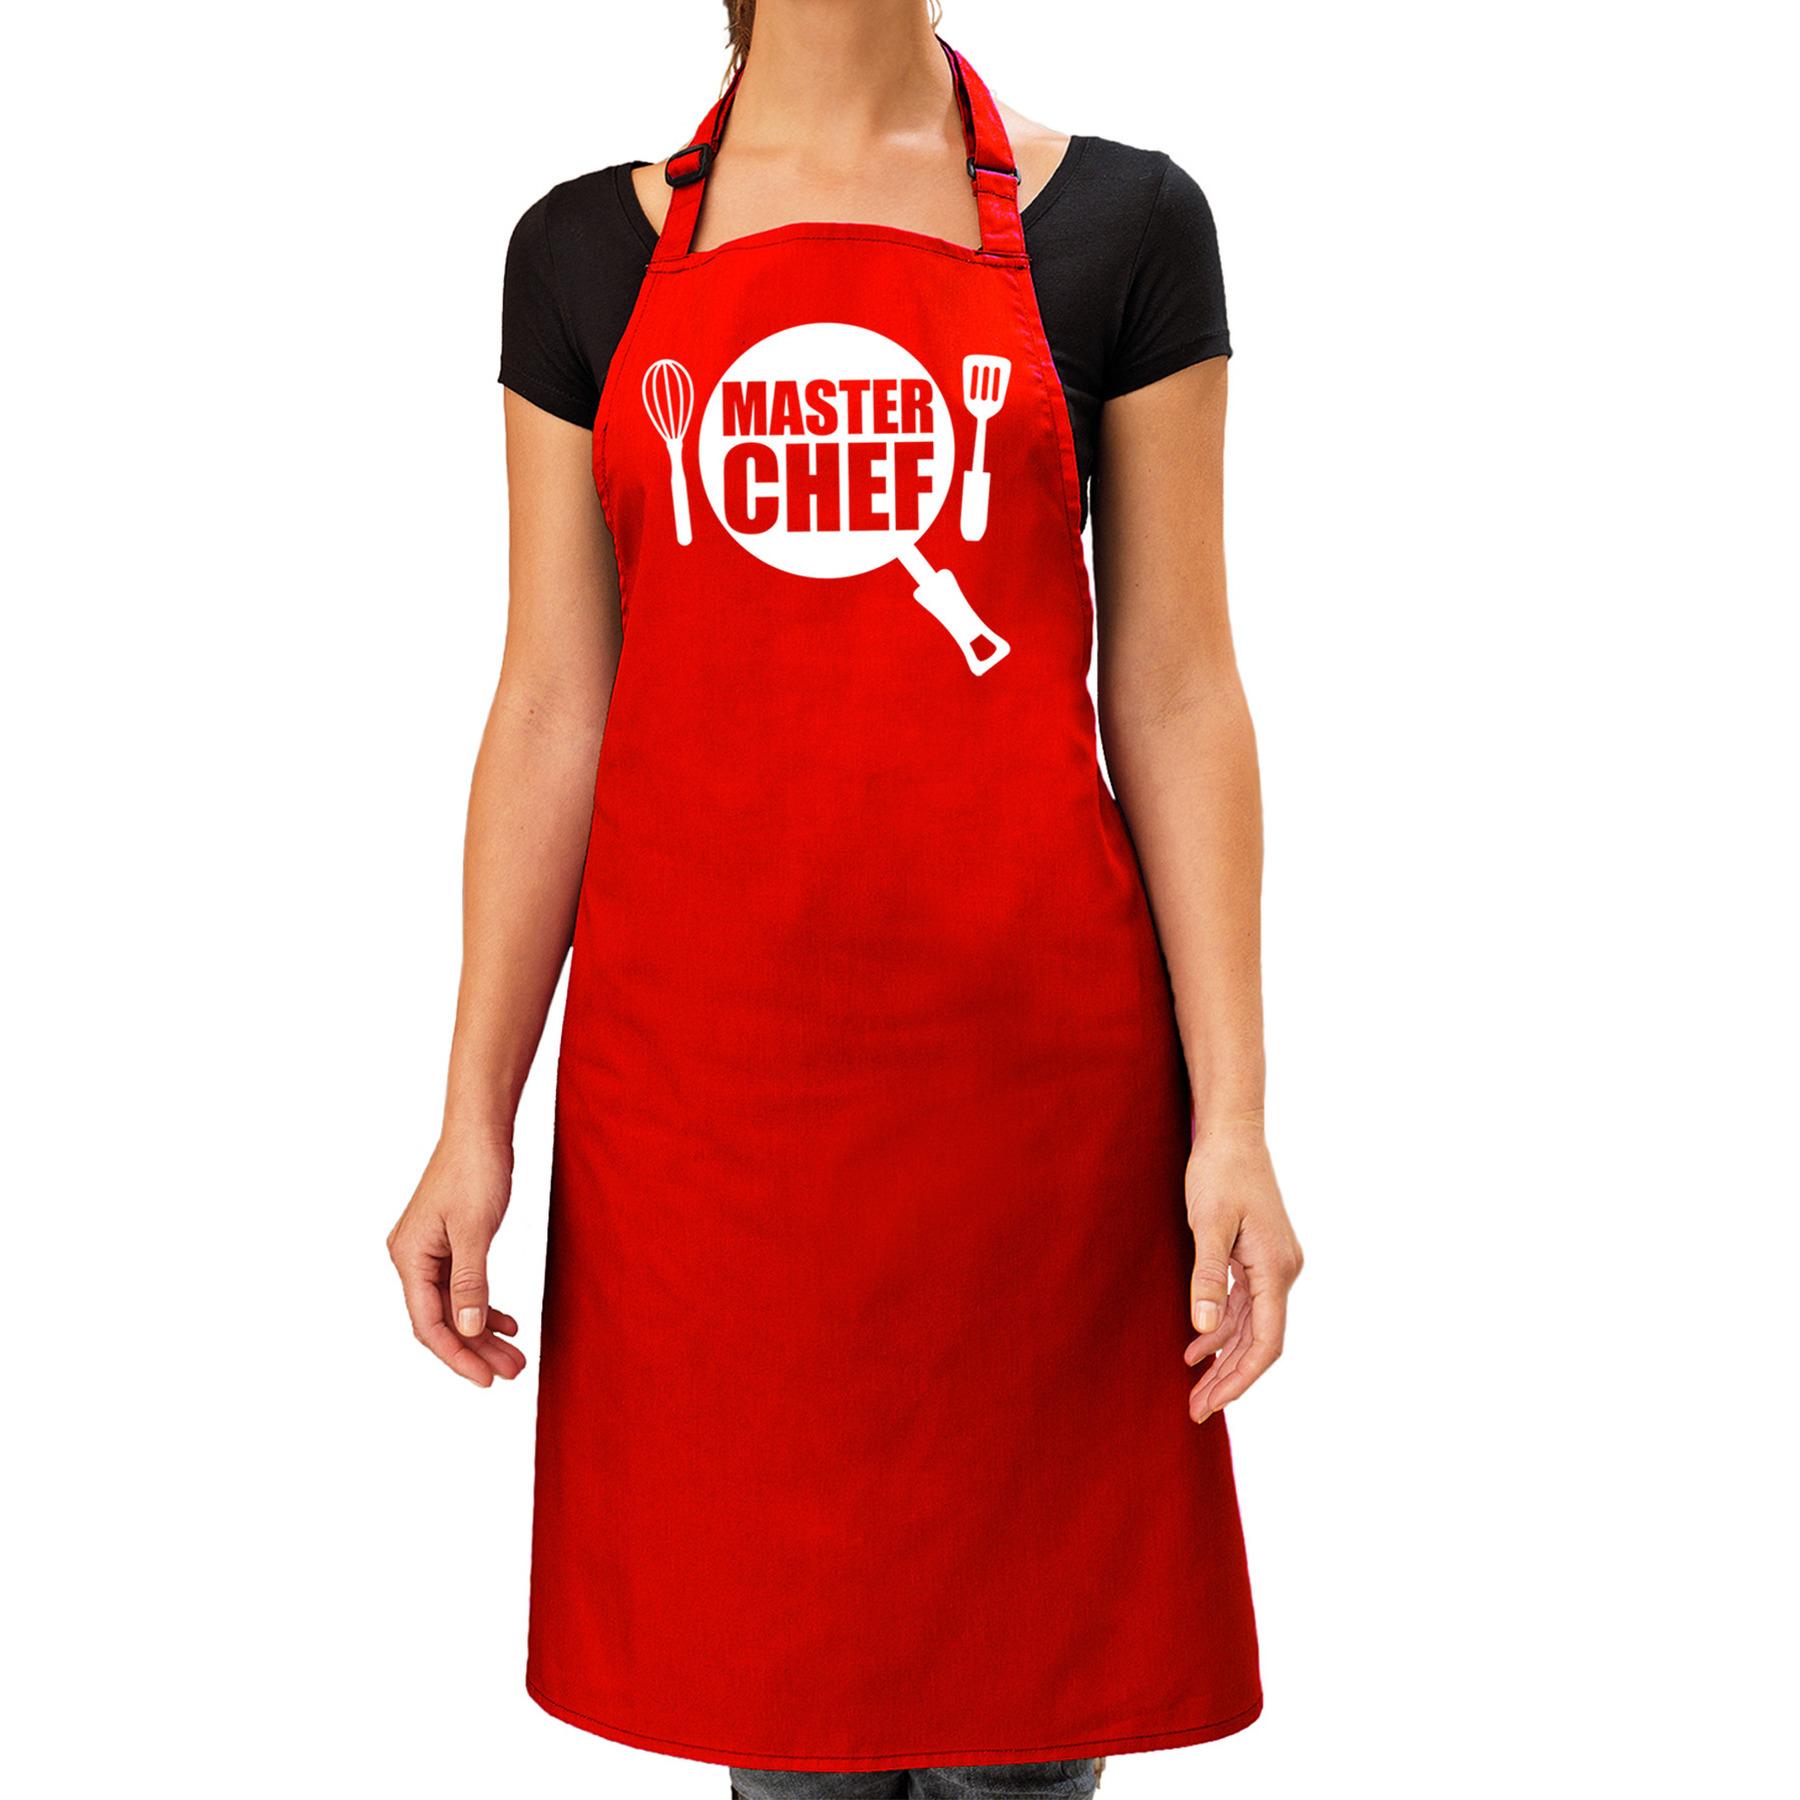 Master chef barbeque schort - keukenschort rood dames